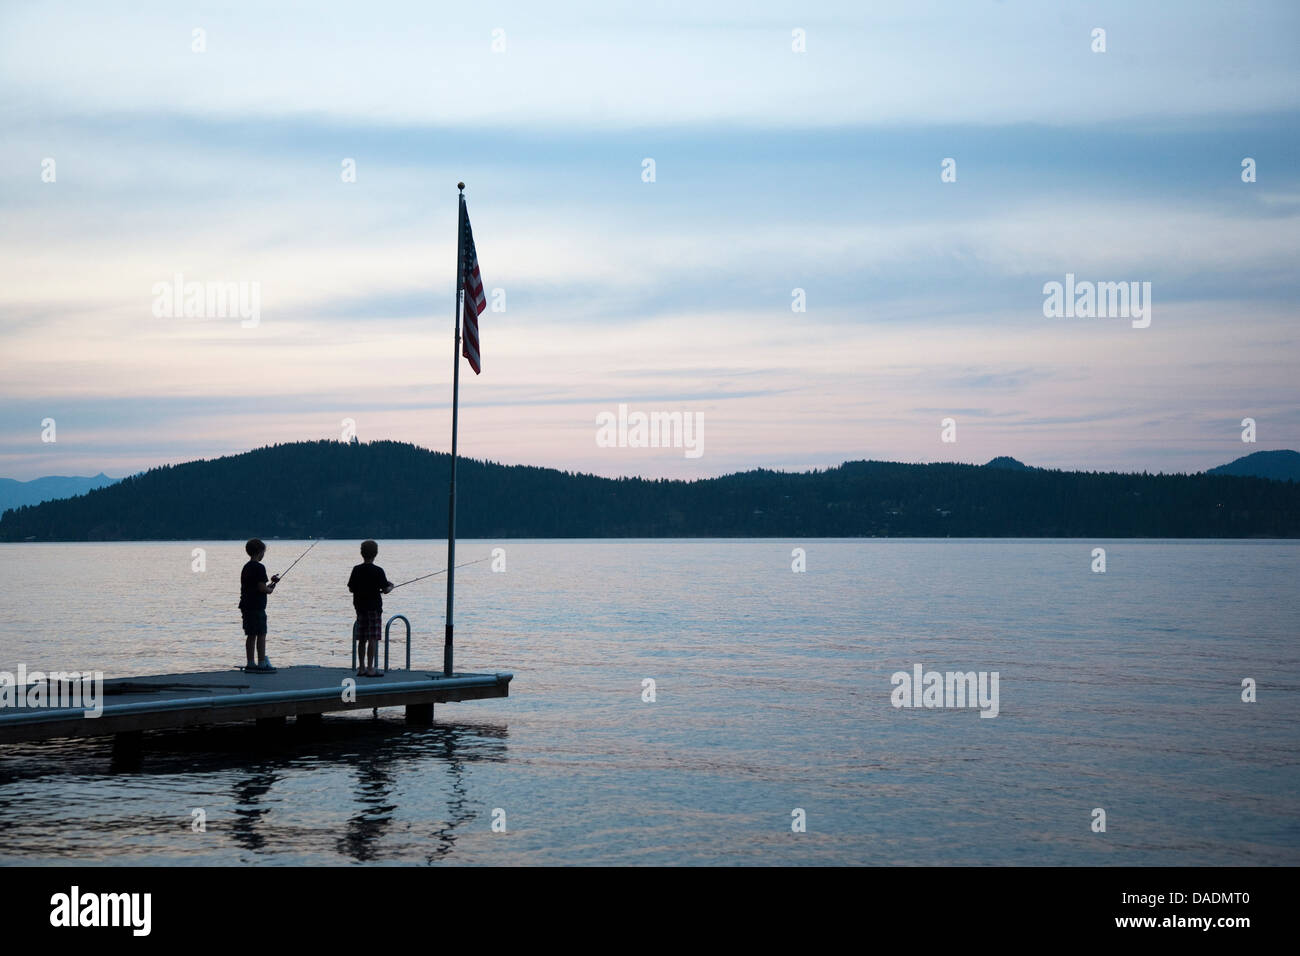 Boys fishing, Lake Pend Oreille, Idaho, USA - Stock Image